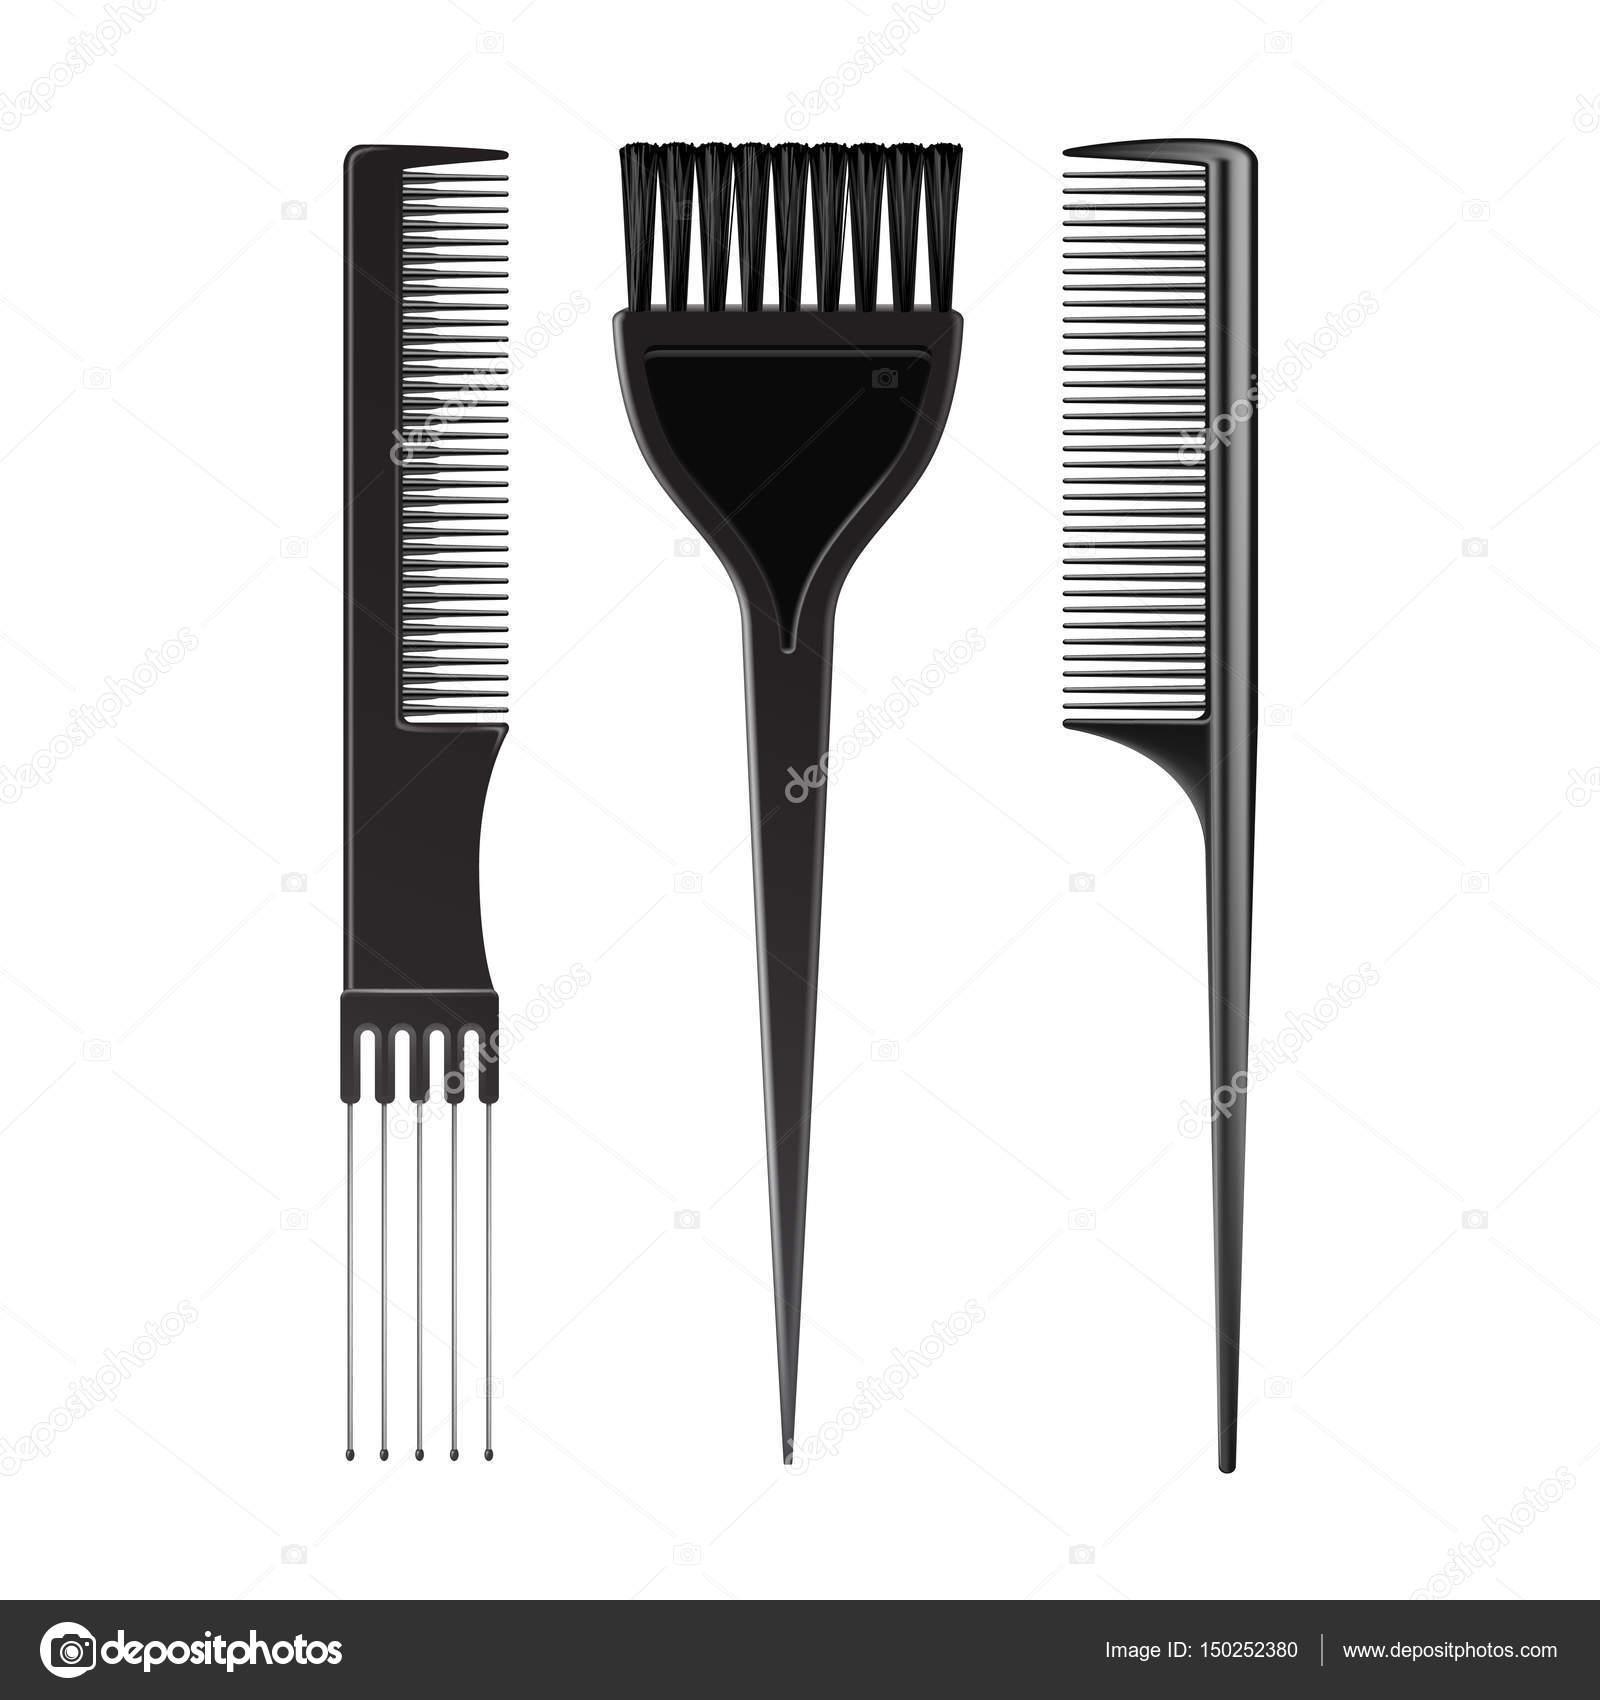 Vector Set of Black Plastic Hair Coloring Brush Comb Professional ...